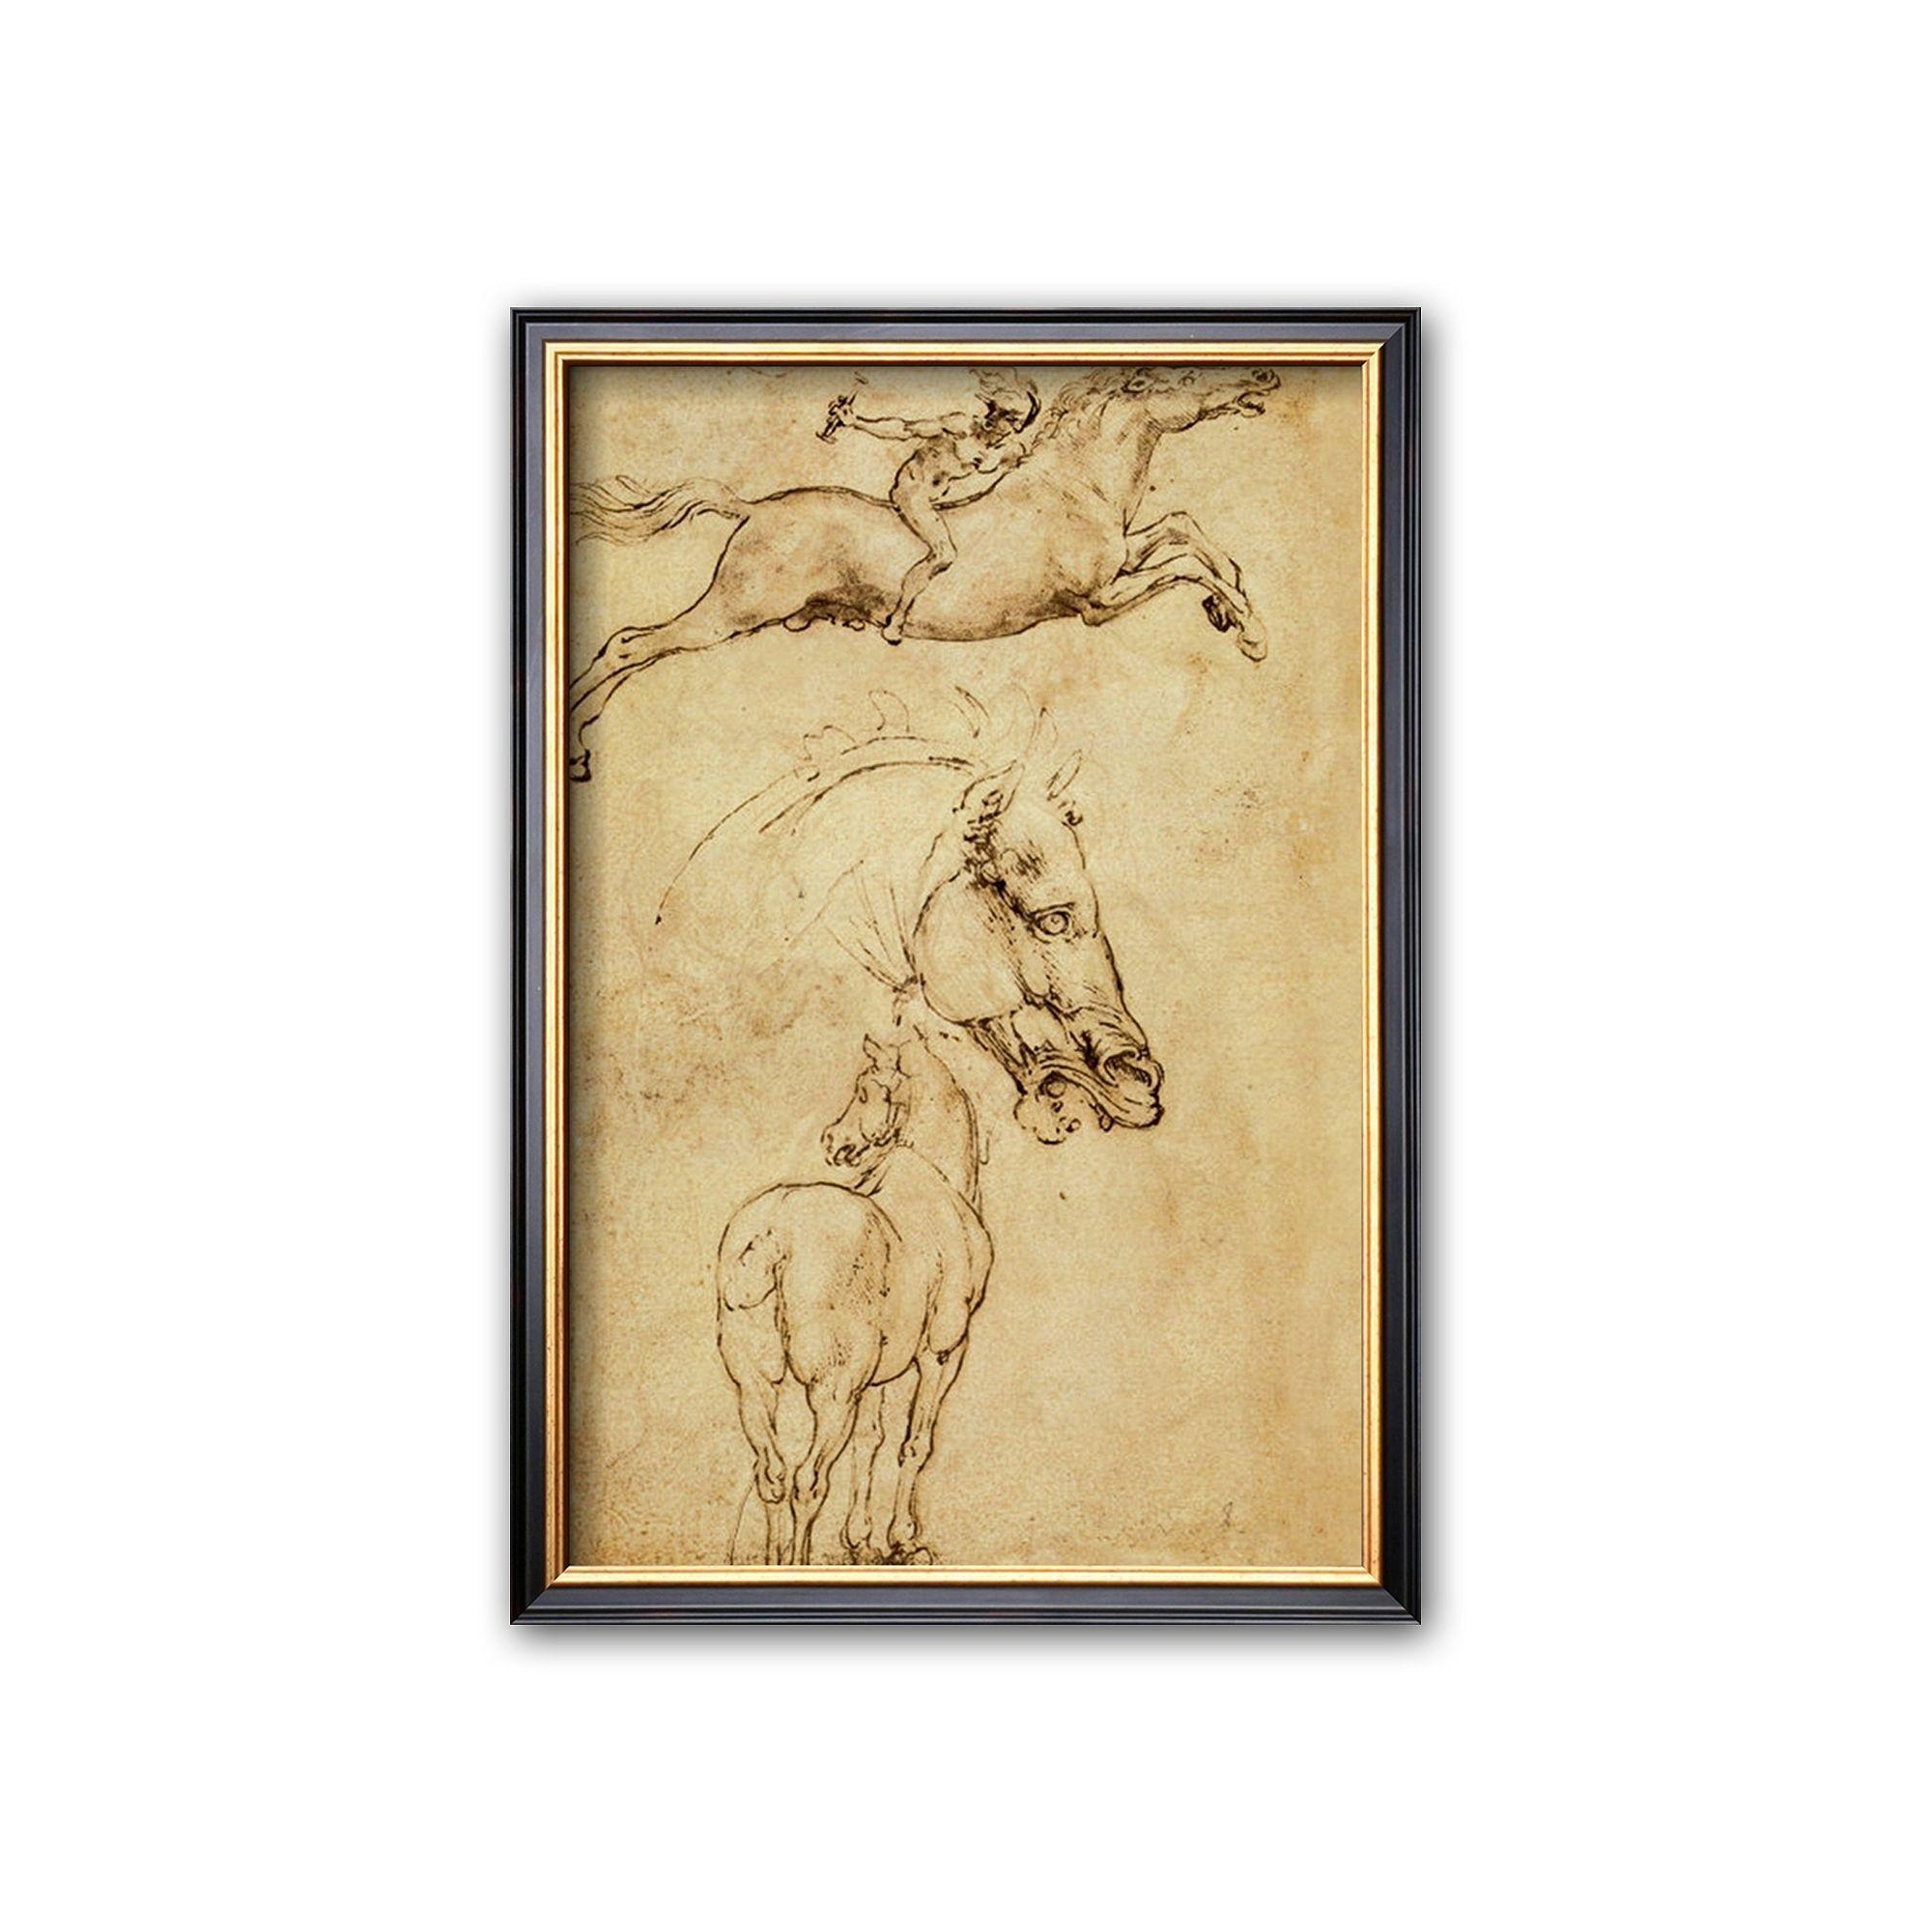 Amazing Da Vinci Wall Art Sketch - Wall Art Collections ...